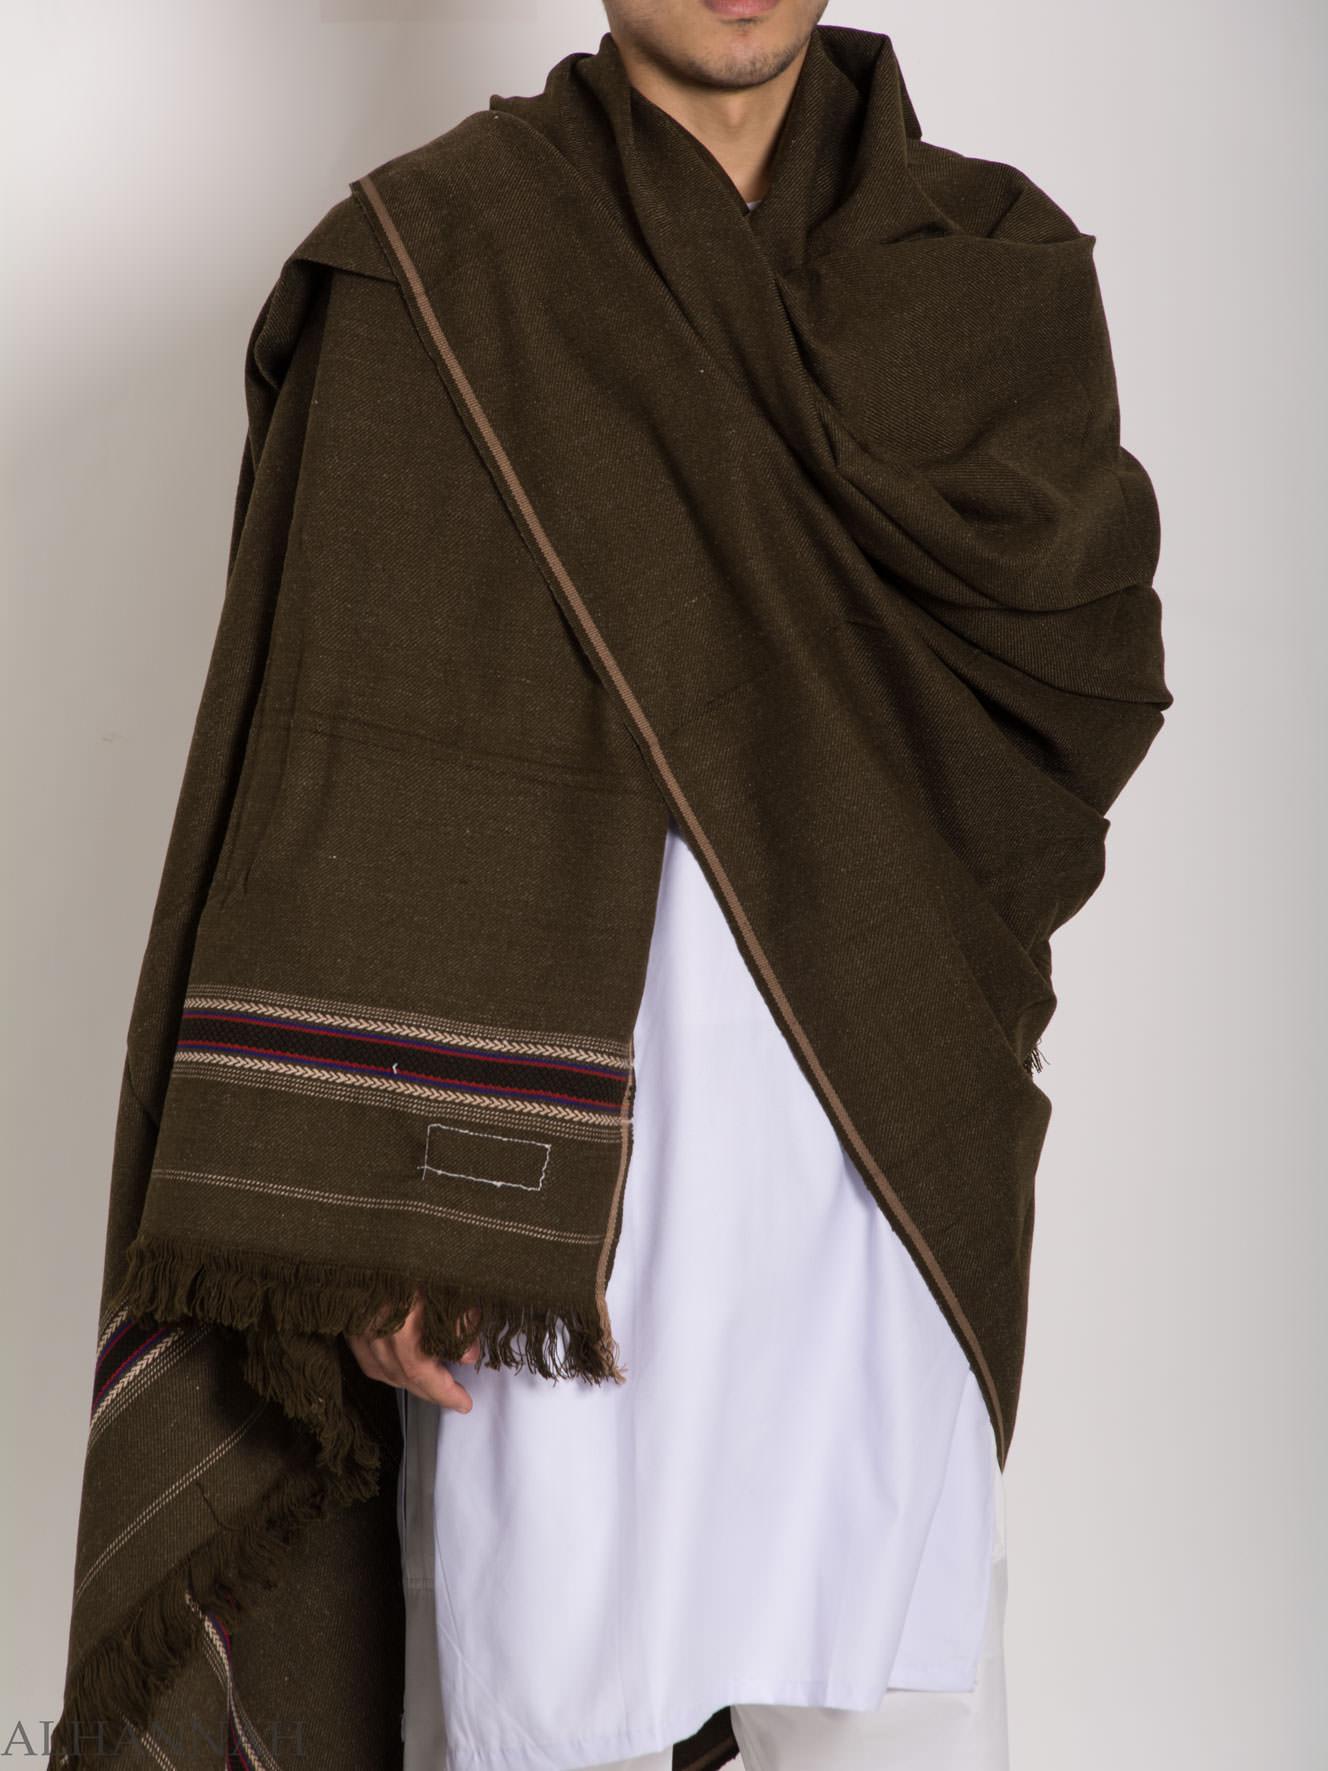 Tasseled Wool Pakistani Shawl With Ethnic Arrowed Pattern